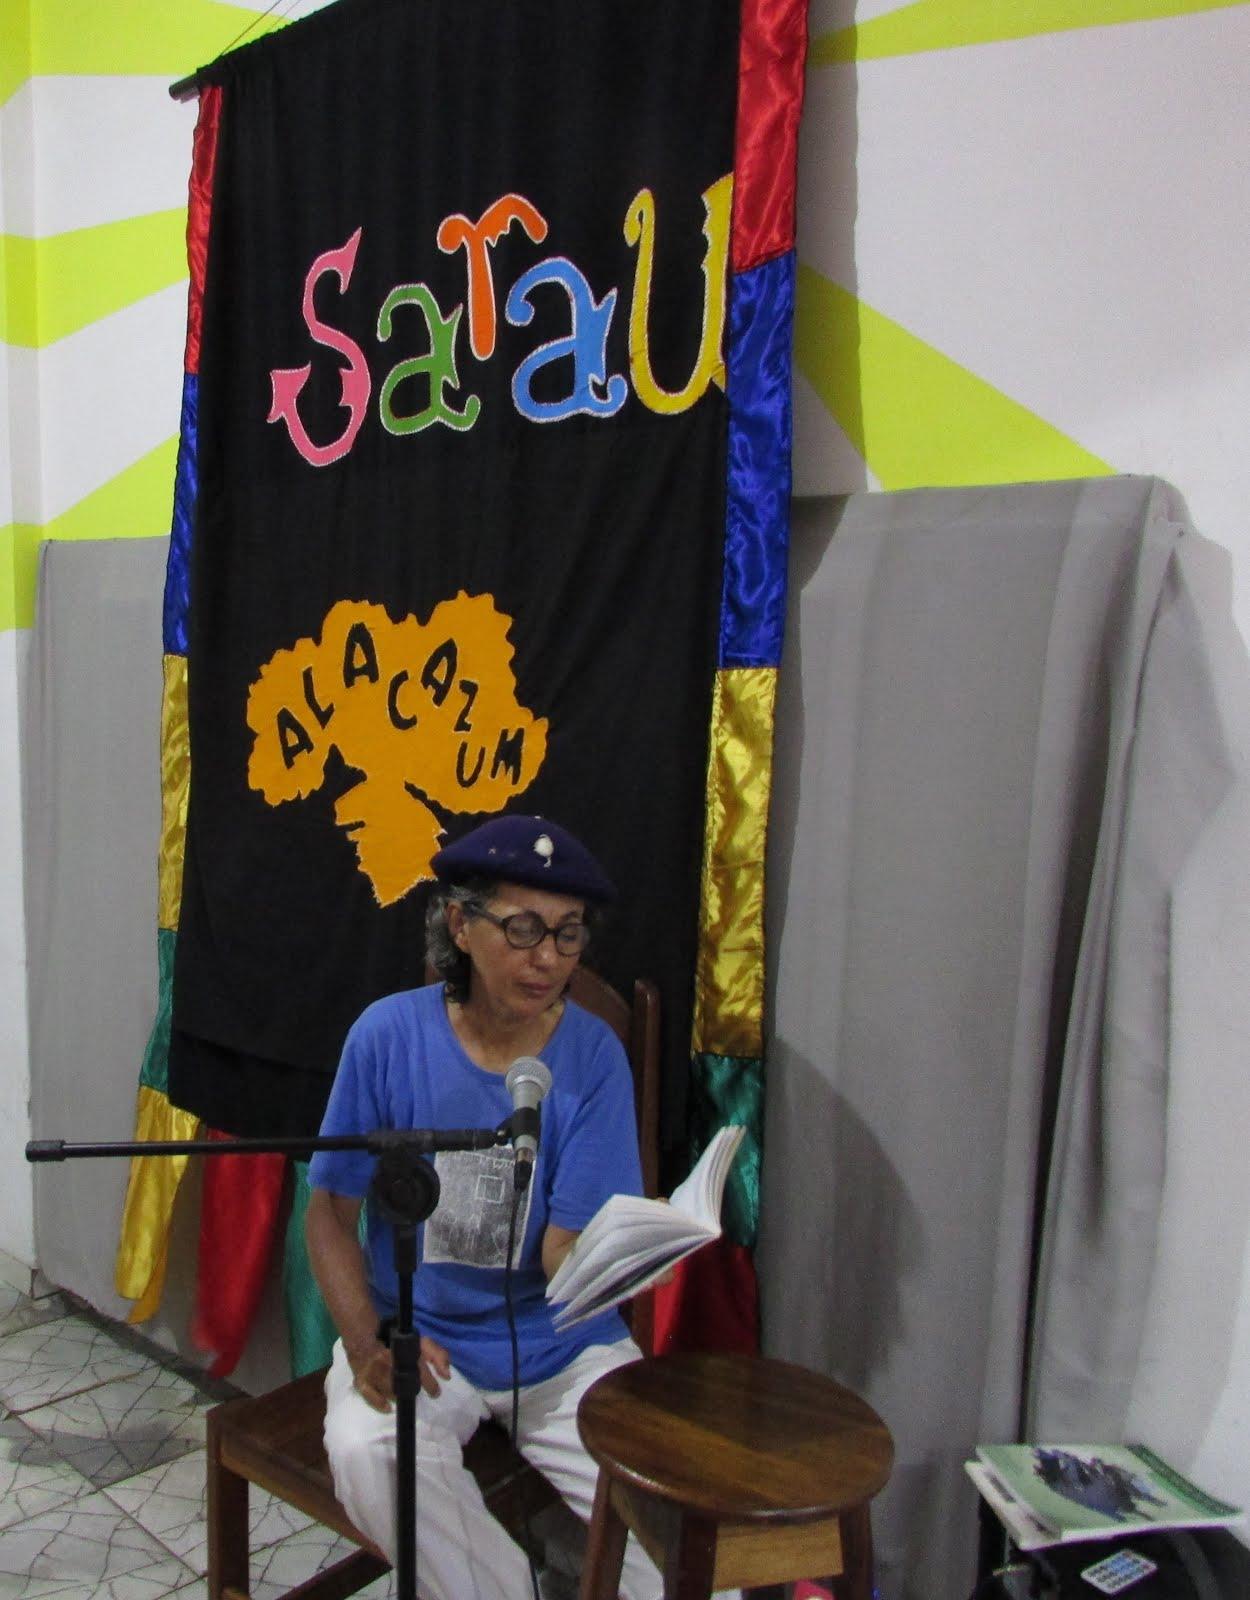 II Sarau Alacazum 2018